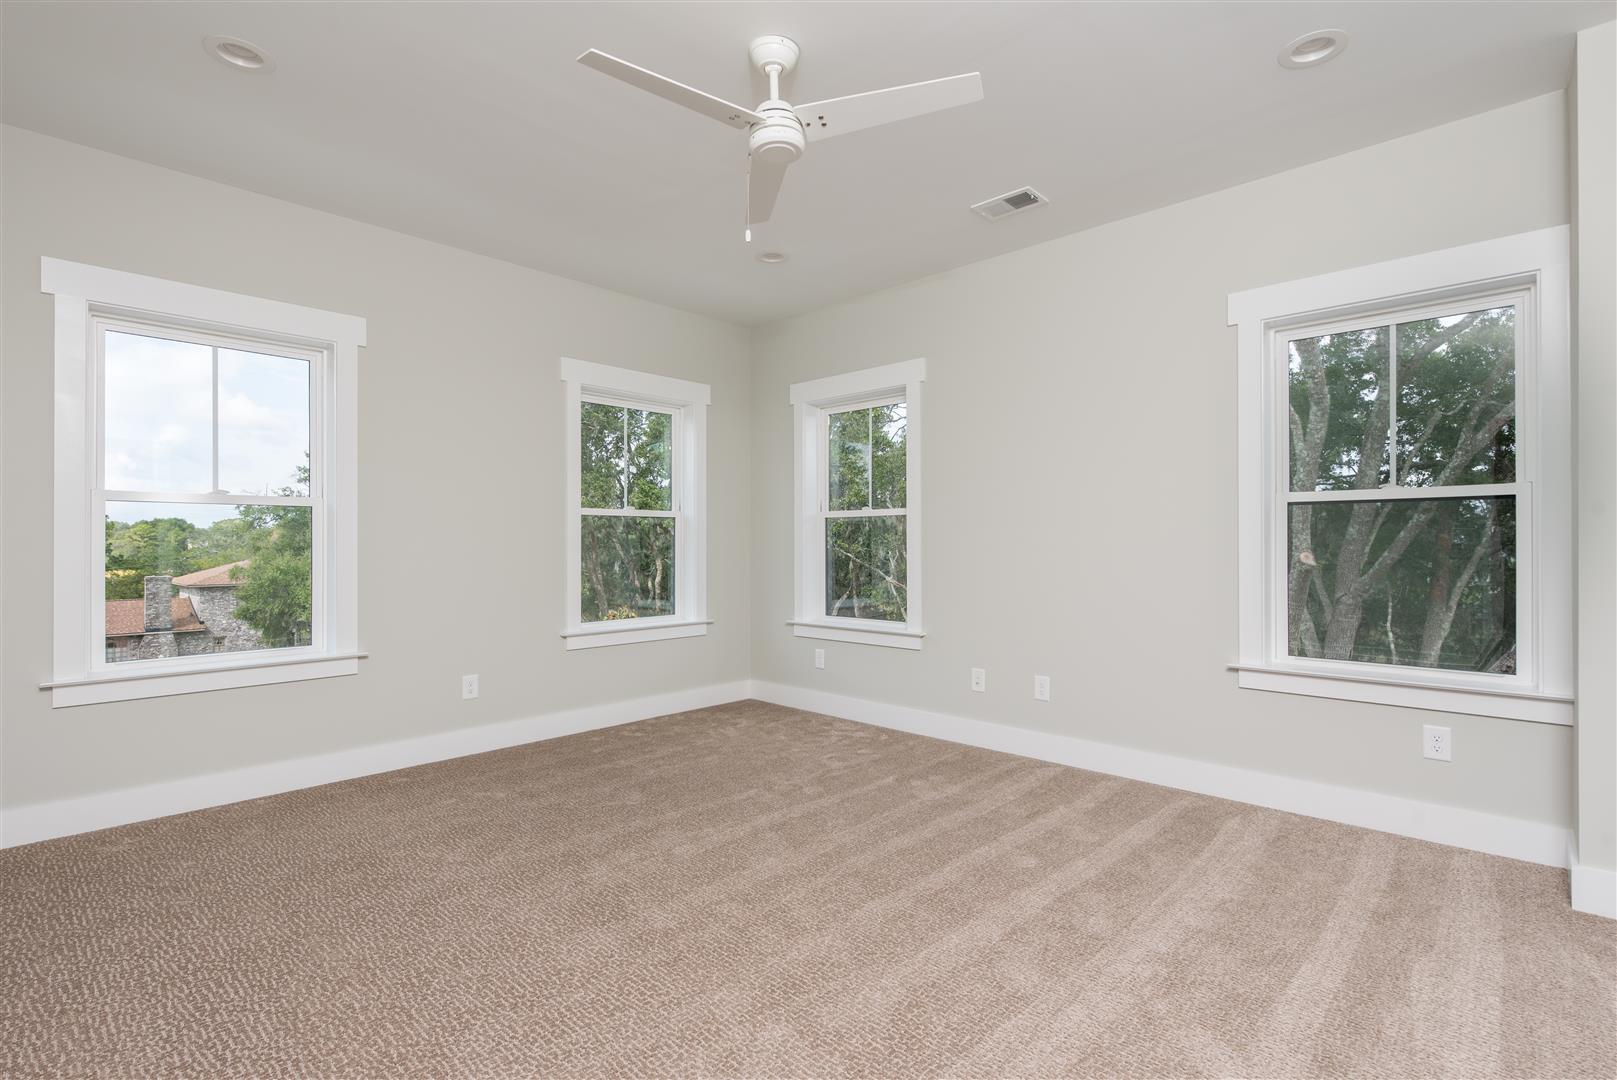 Scanlonville Homes For Sale - 160 5th, Mount Pleasant, SC - 2